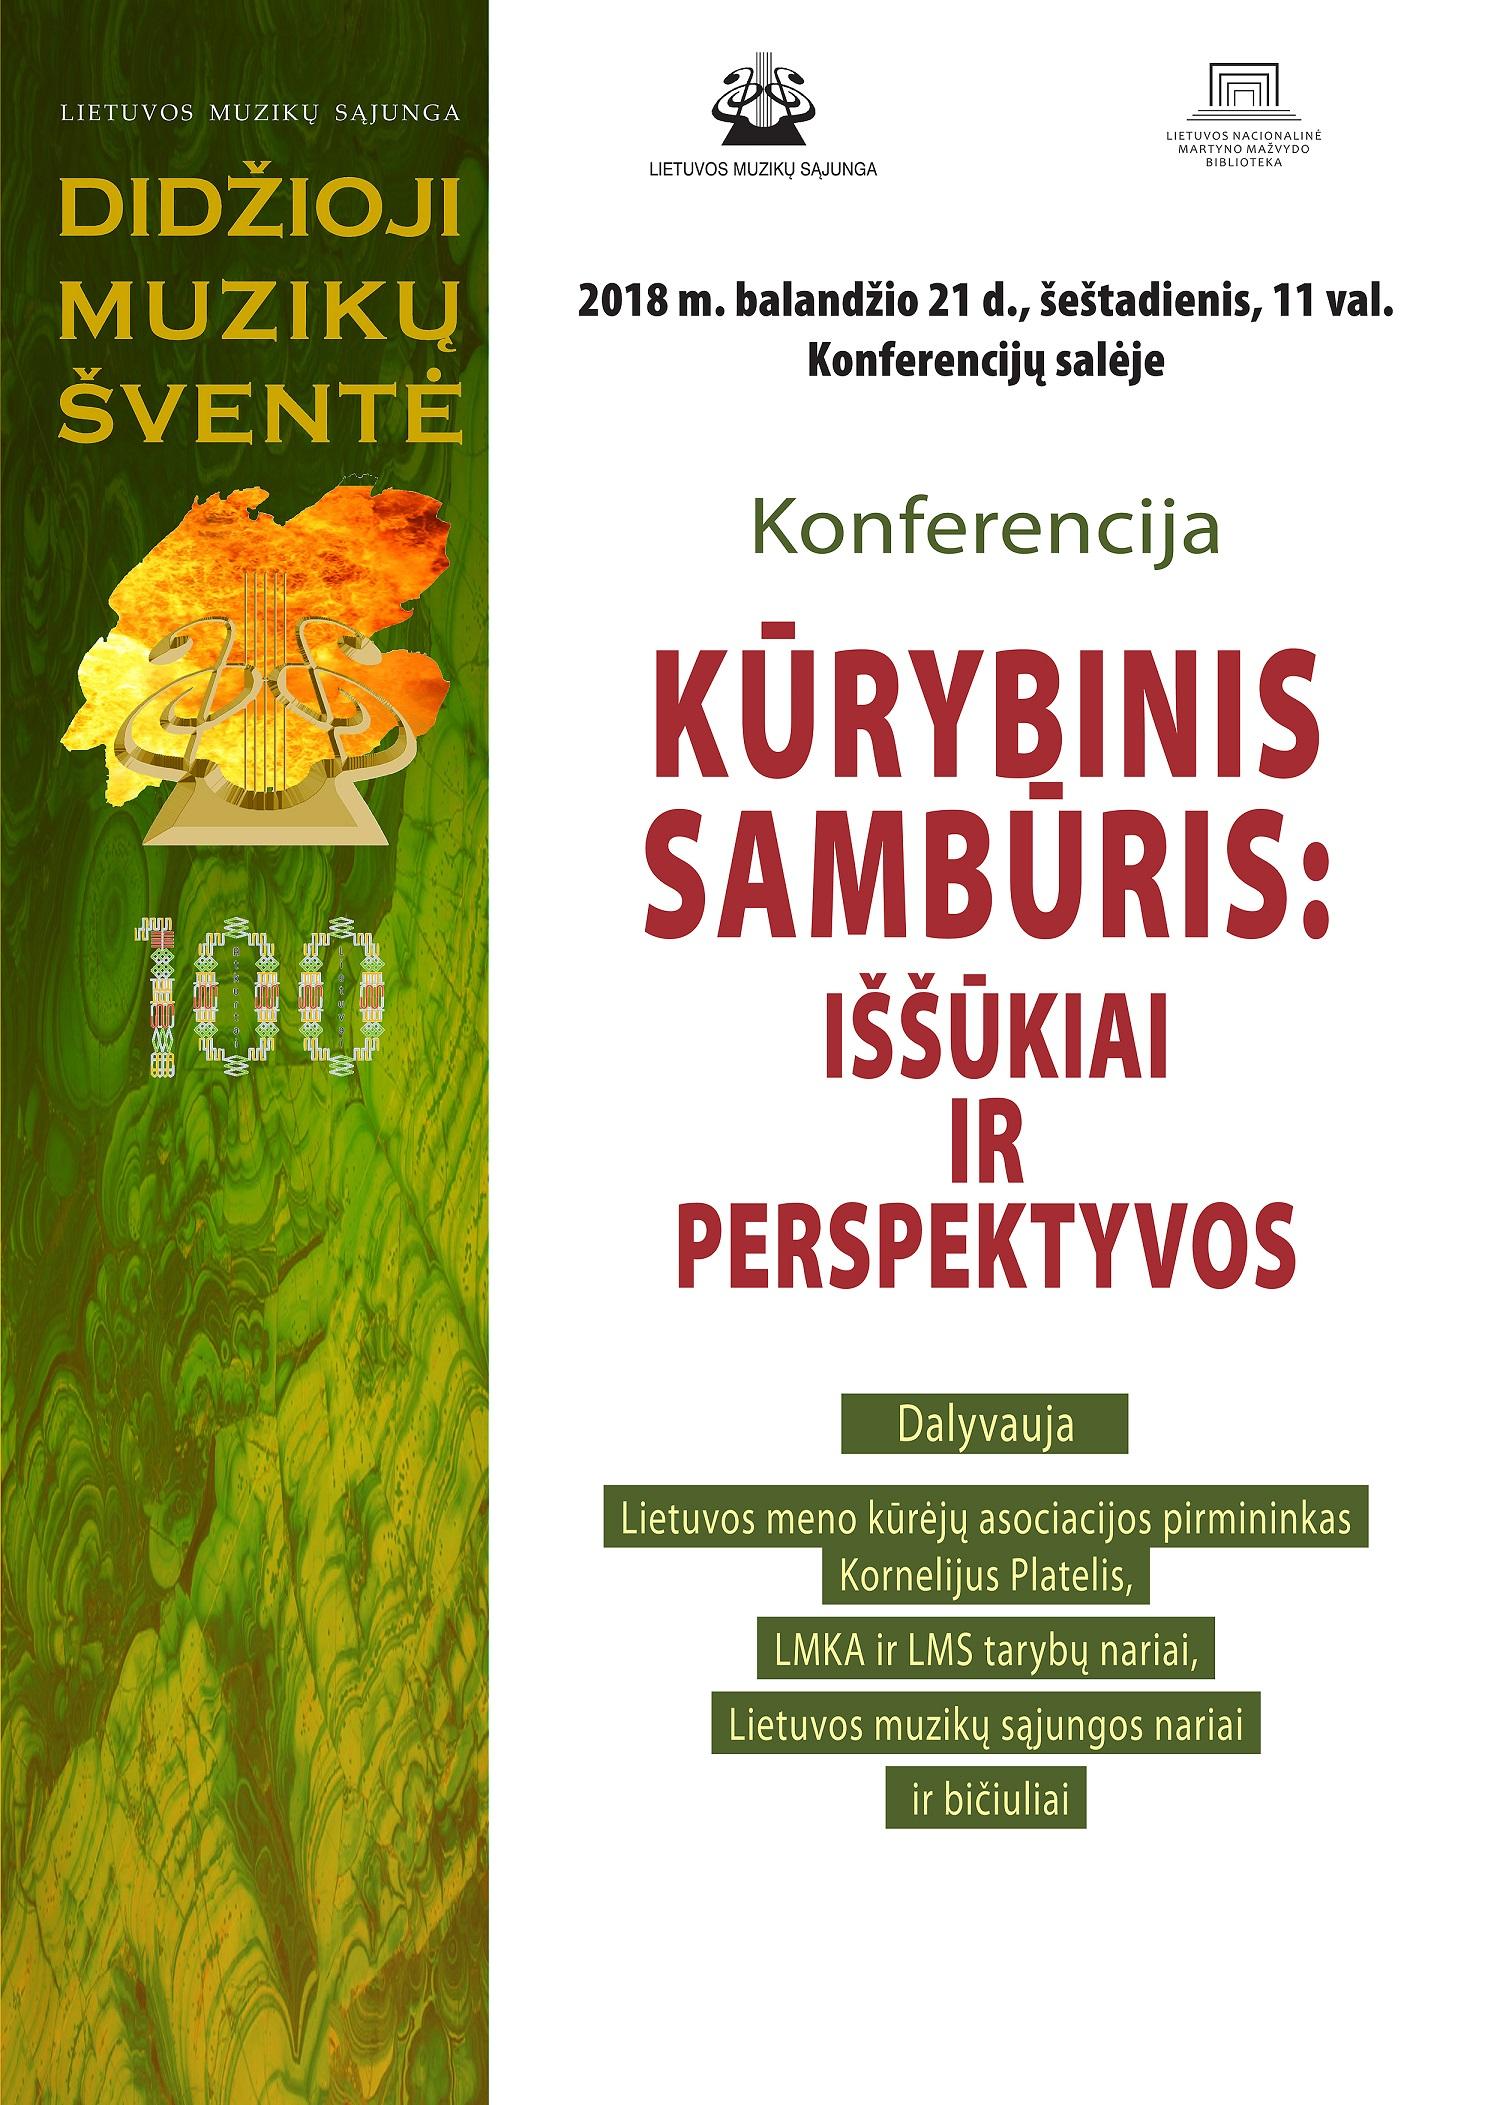 21_konferencija_DMS plakatai4-5-1A4